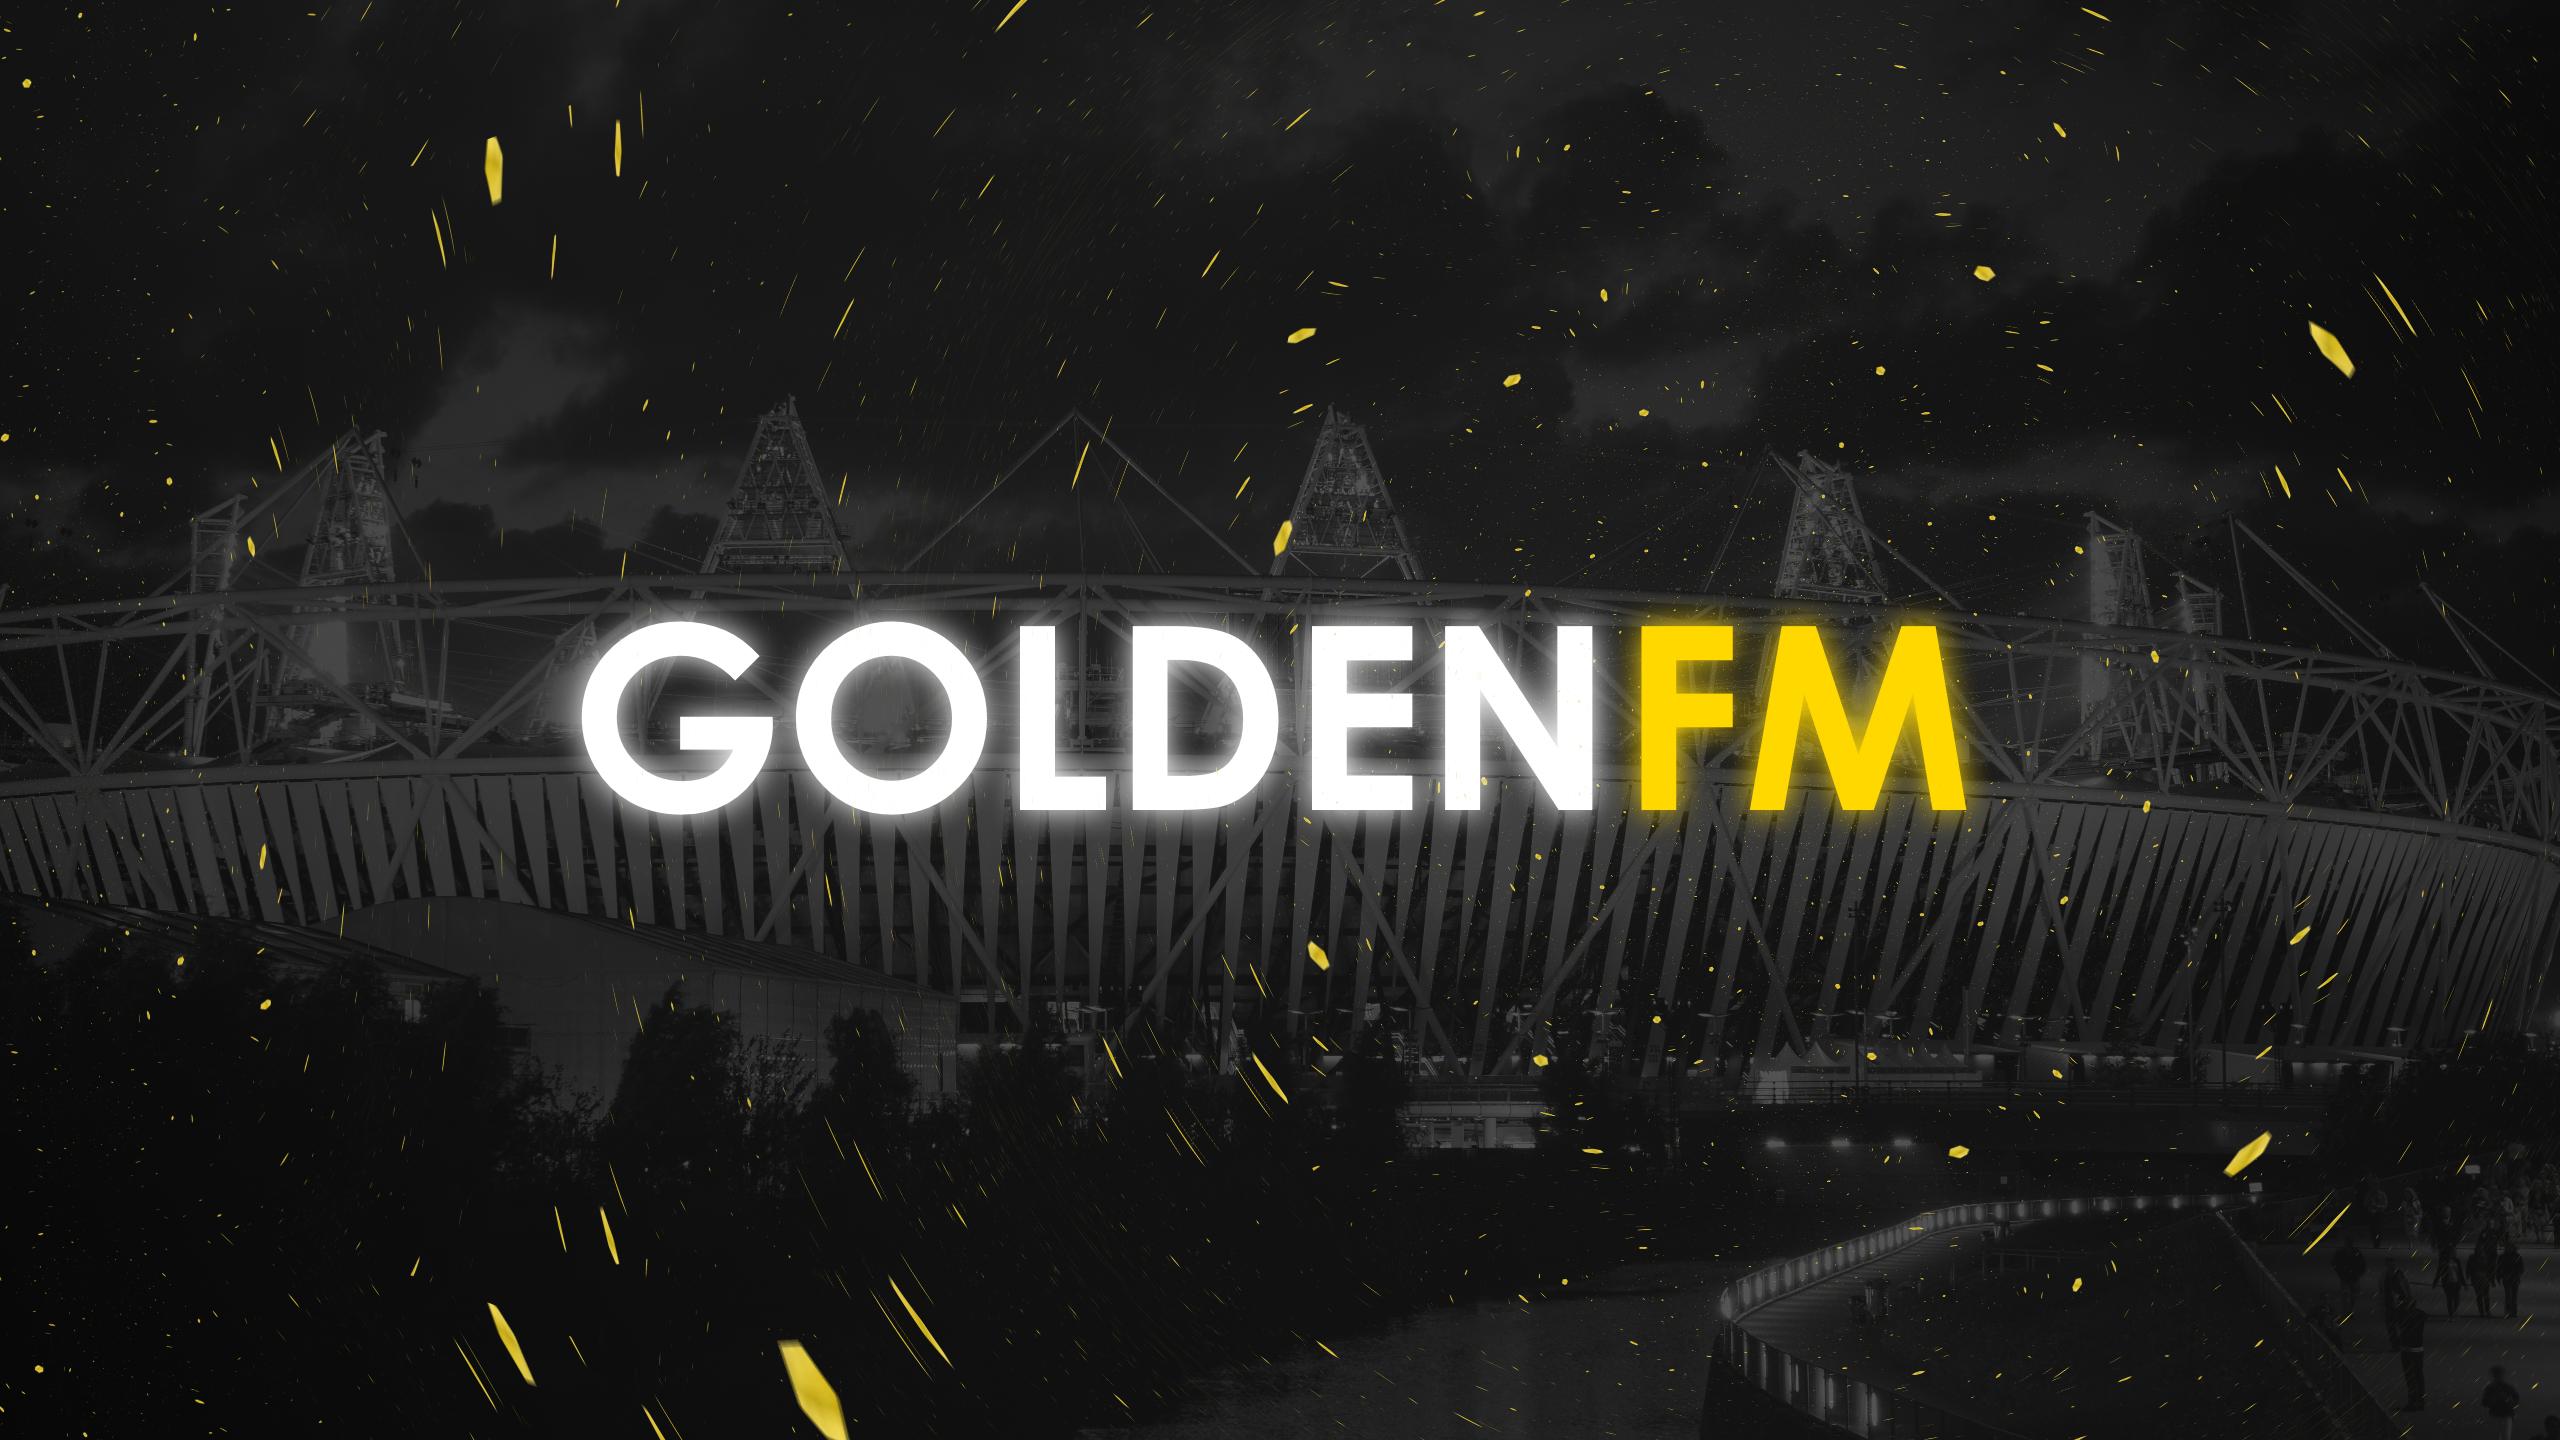 Golden FM is creating Regen Rovers & Football Manager videos